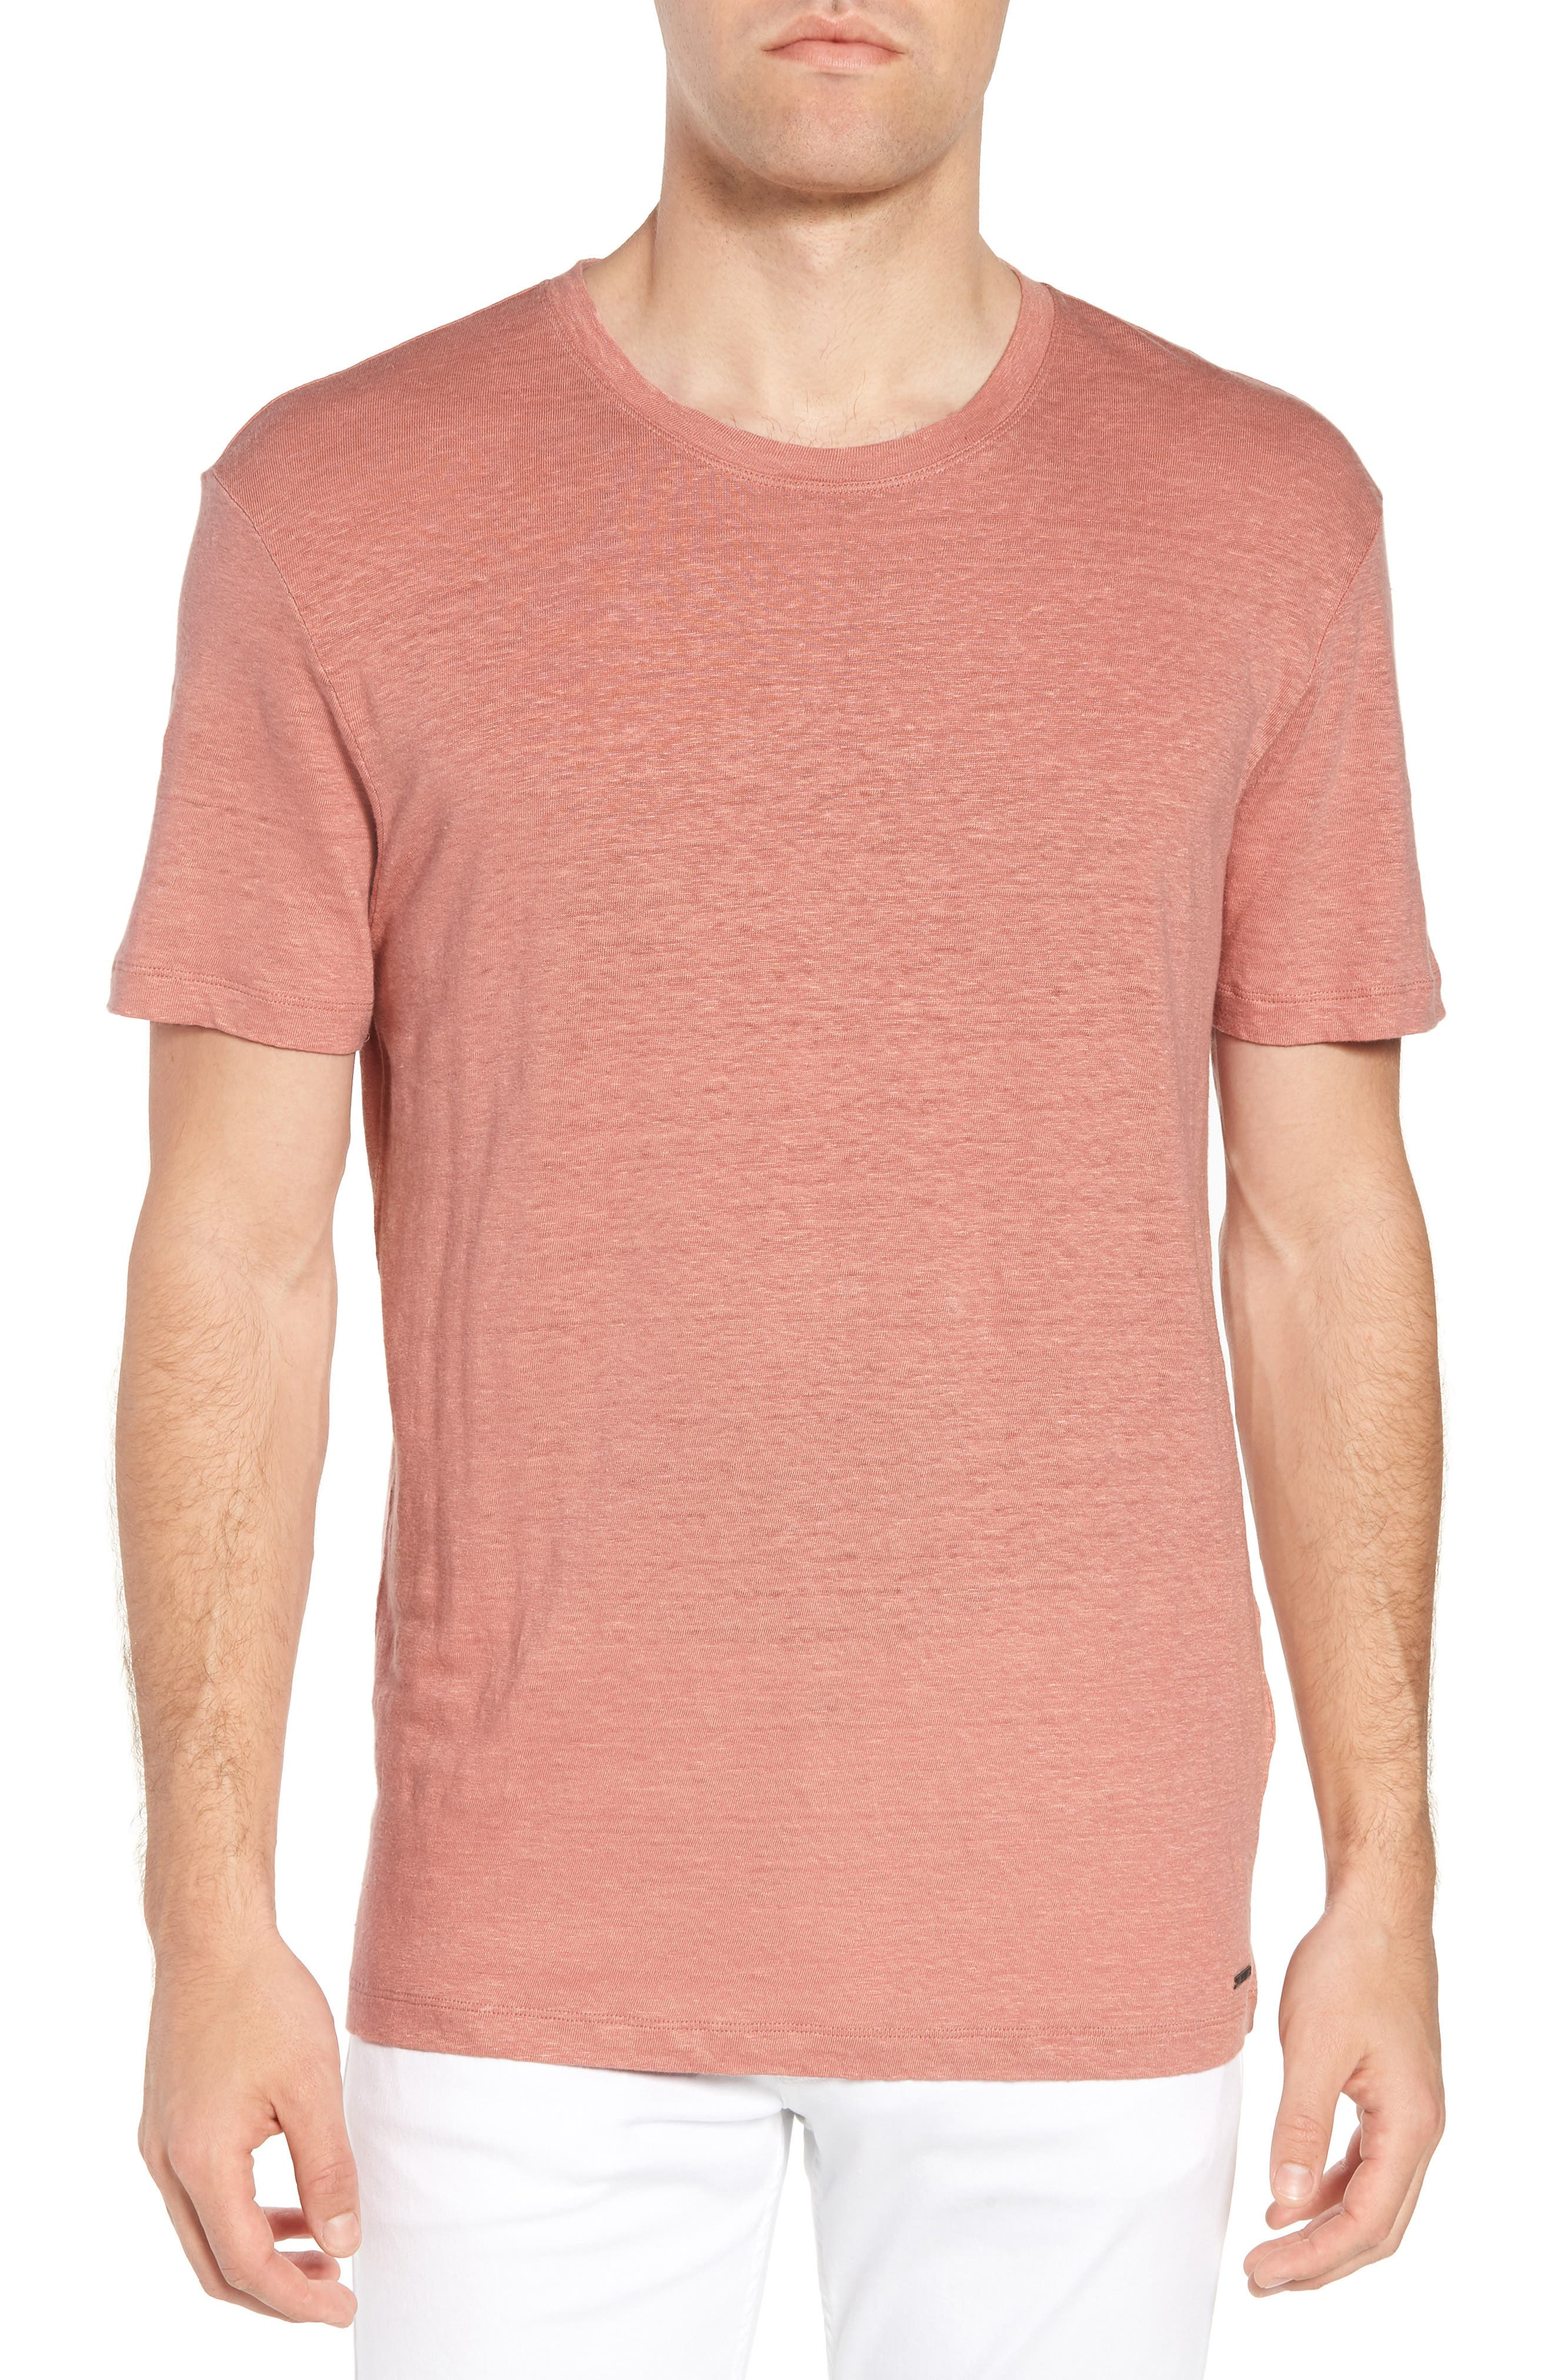 Hugo Boss Tiburt Linen T-Shirt,                         Main,                         color, 631